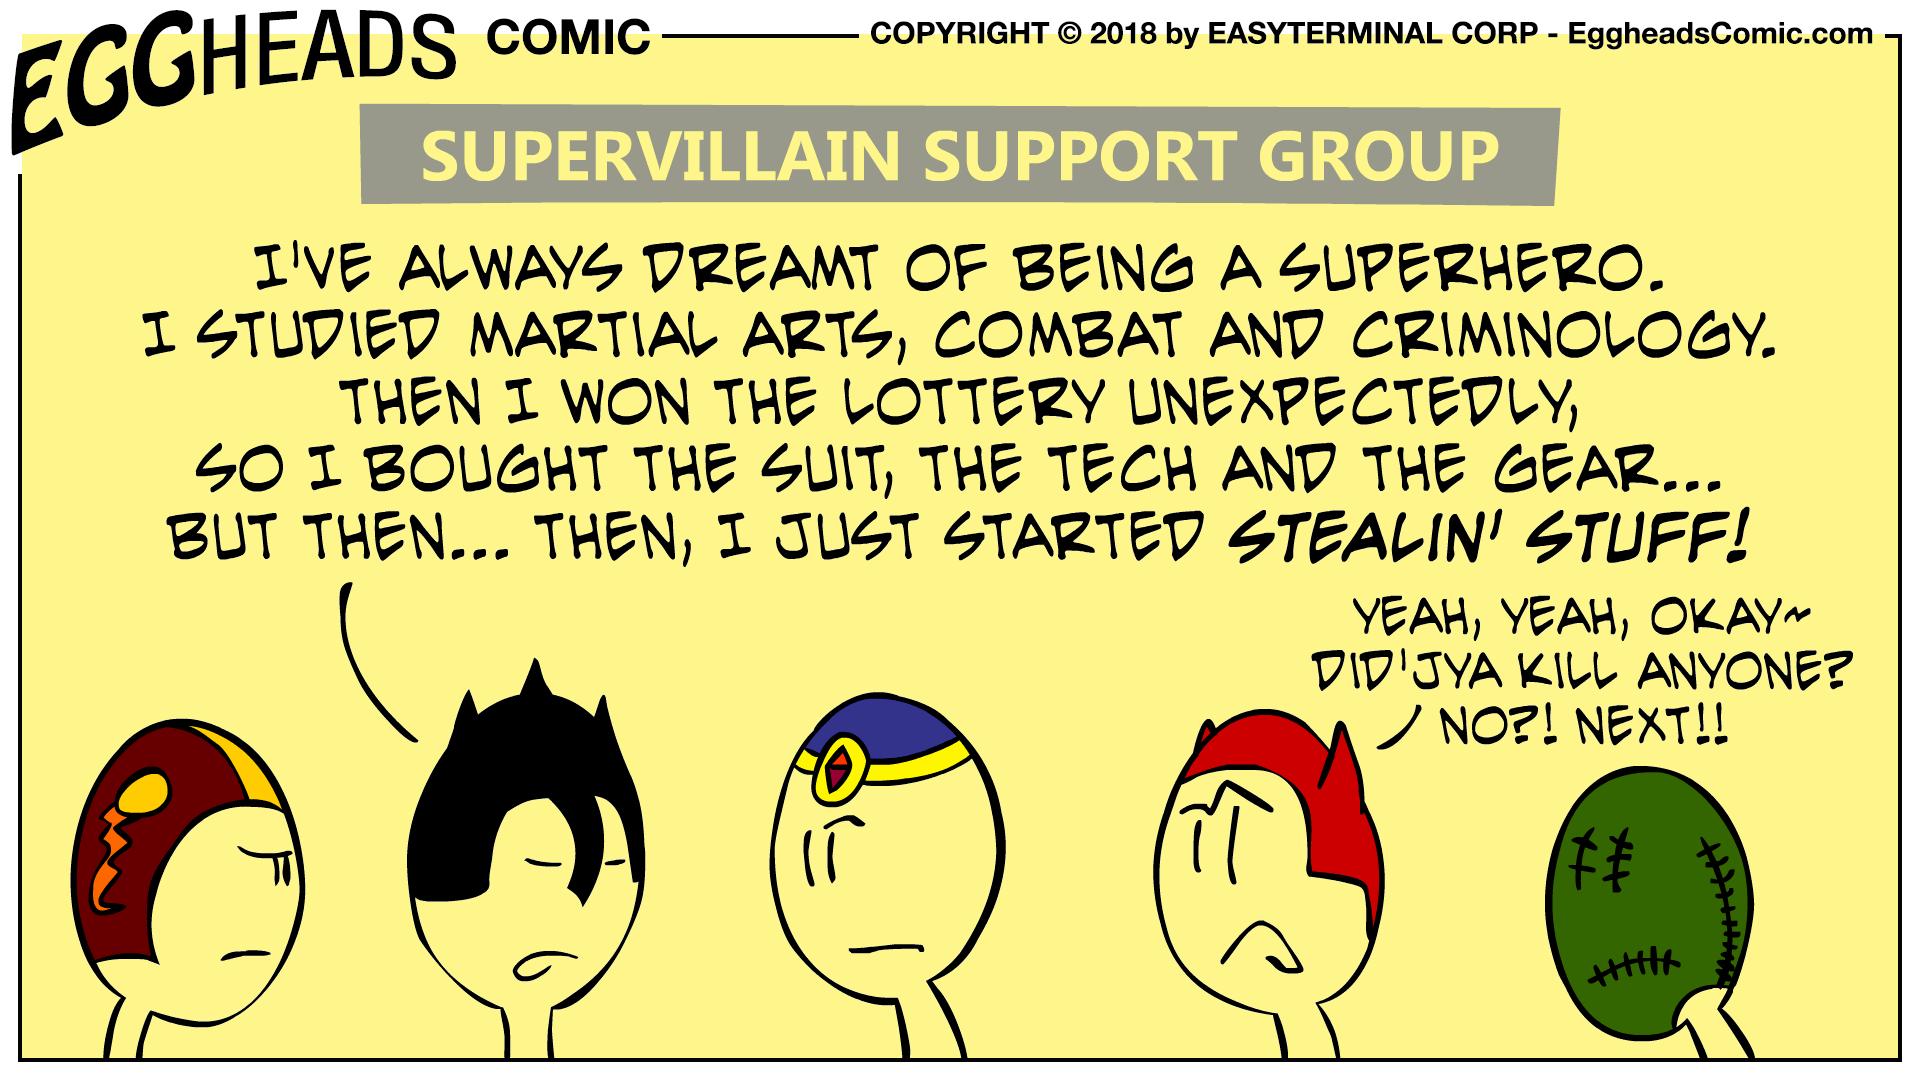 Webcomic Eggheads Comic Strip 068 Supervillain